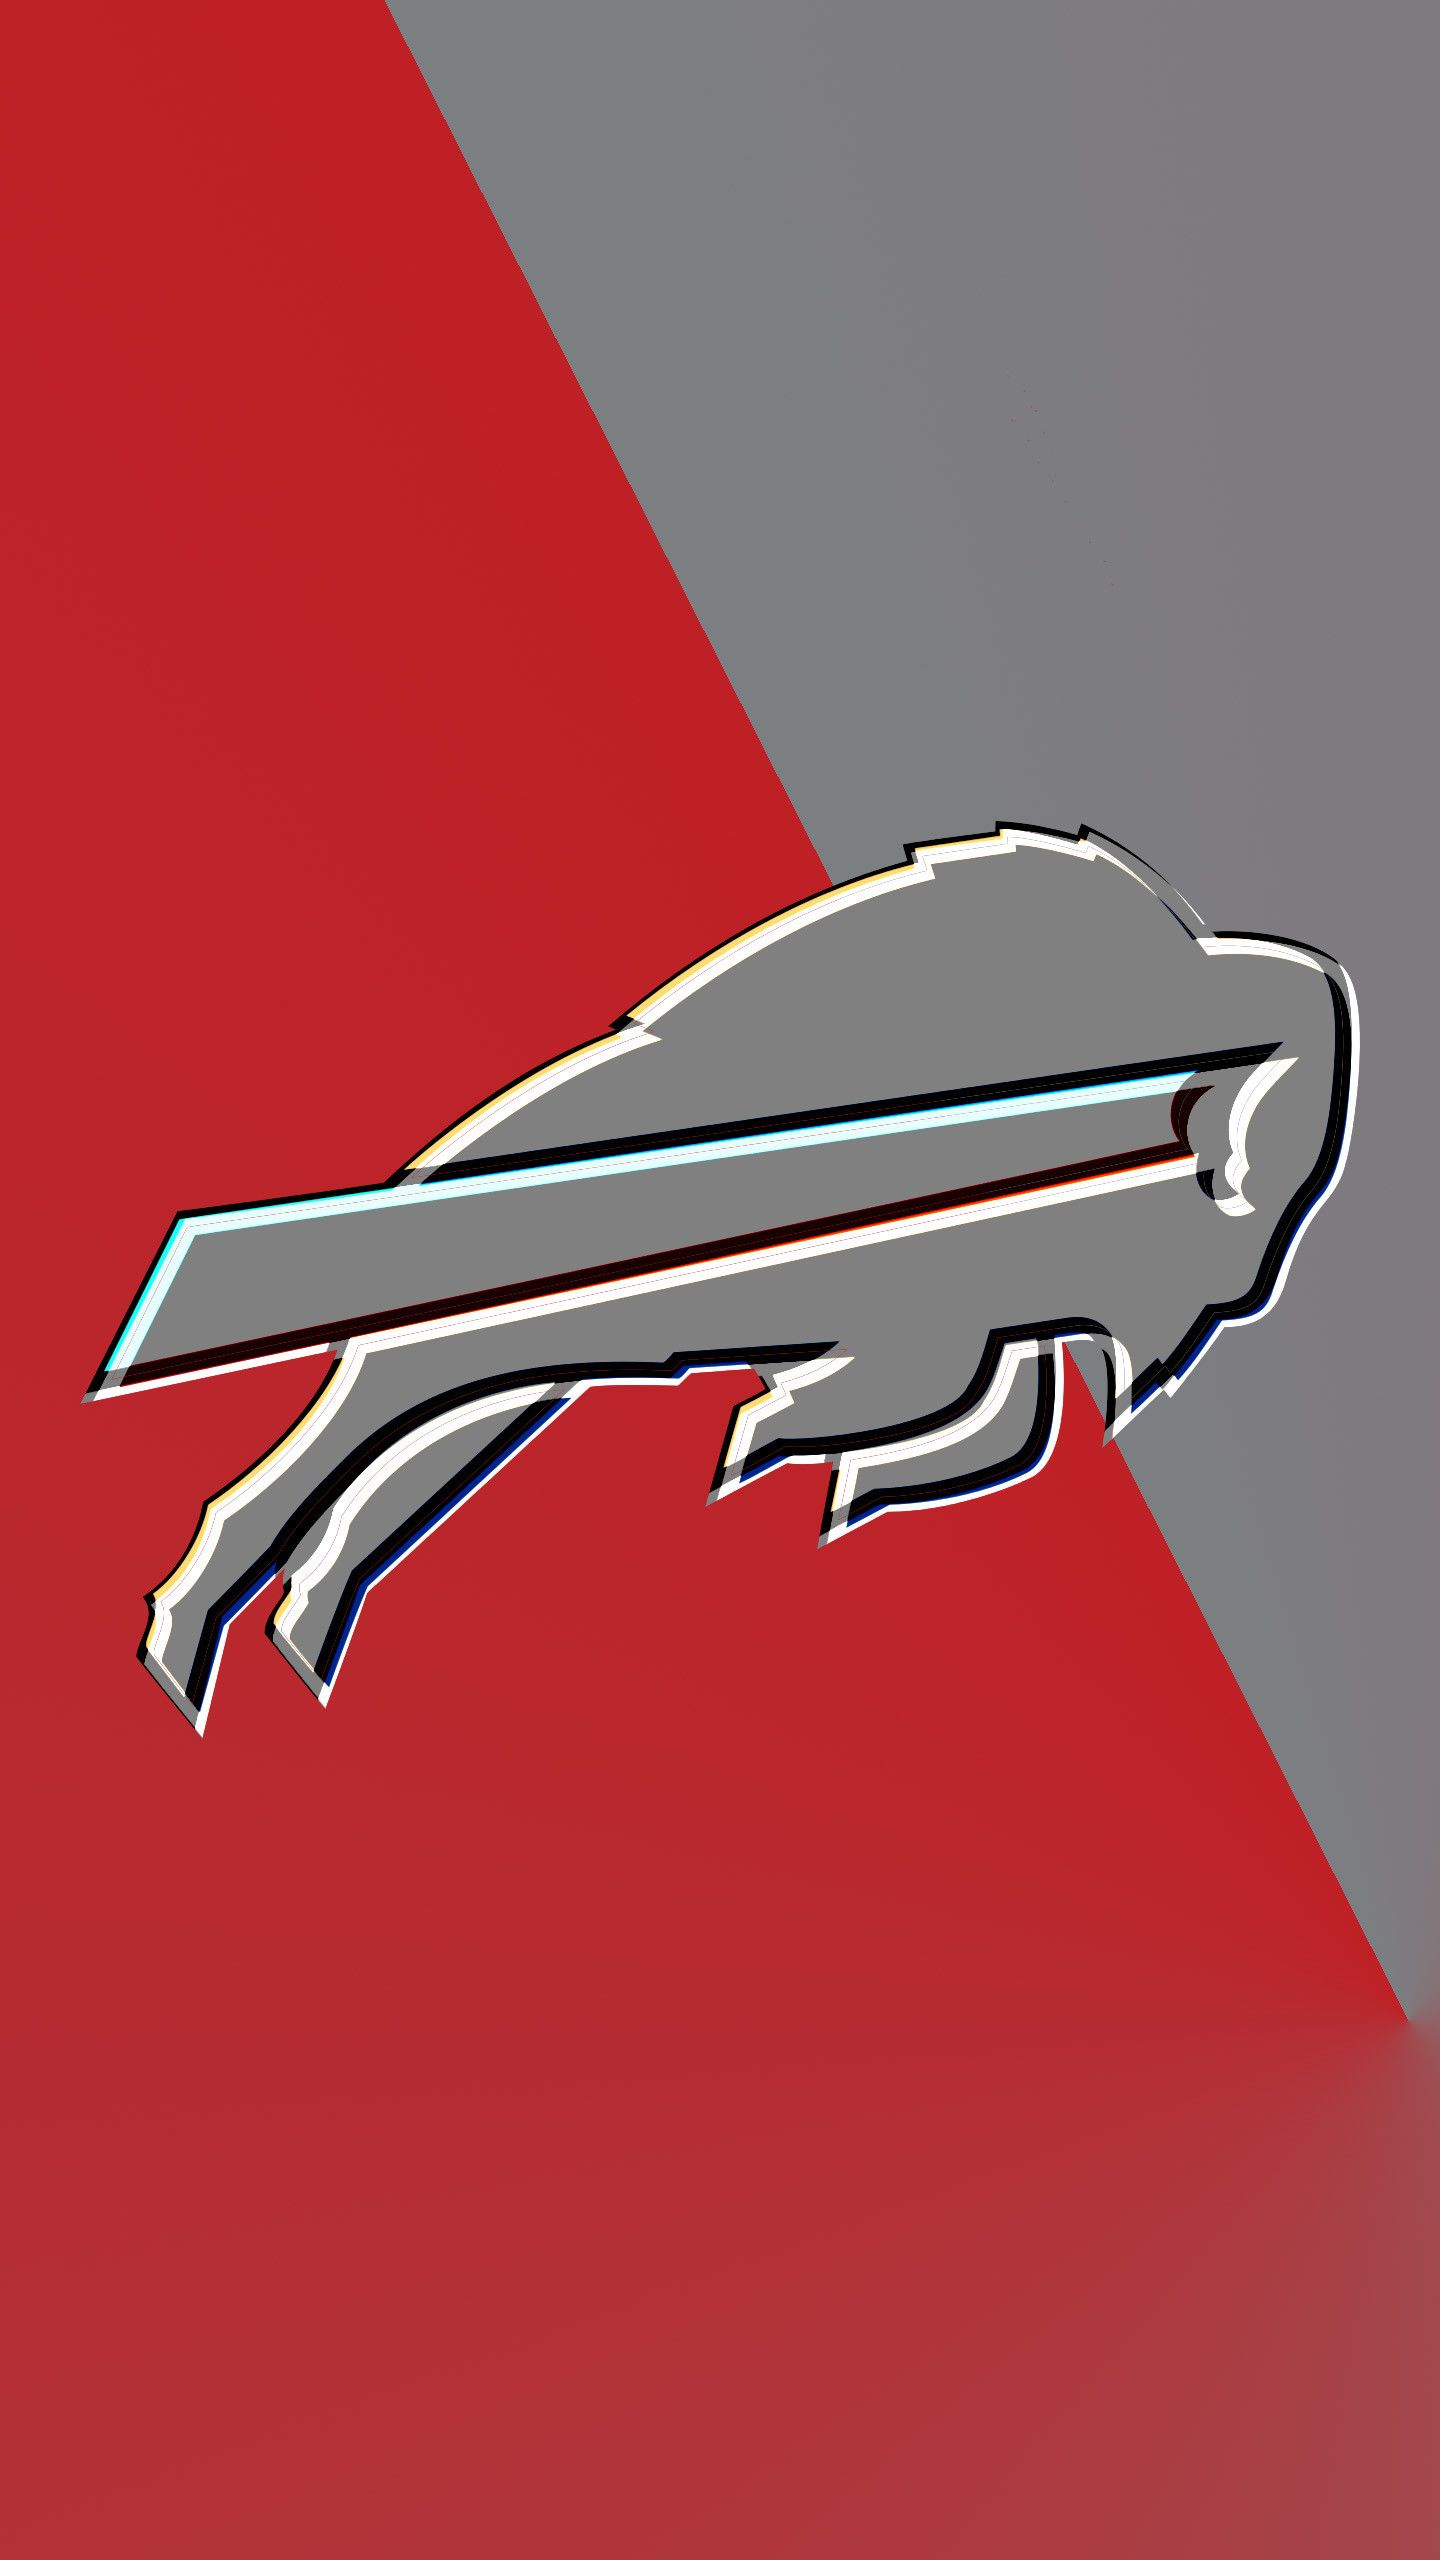 Buffalo Bills Wallpaper Screensaver 73 Images Buffalo Bills Minnesota Vikings Football Buffalo Bills Logo